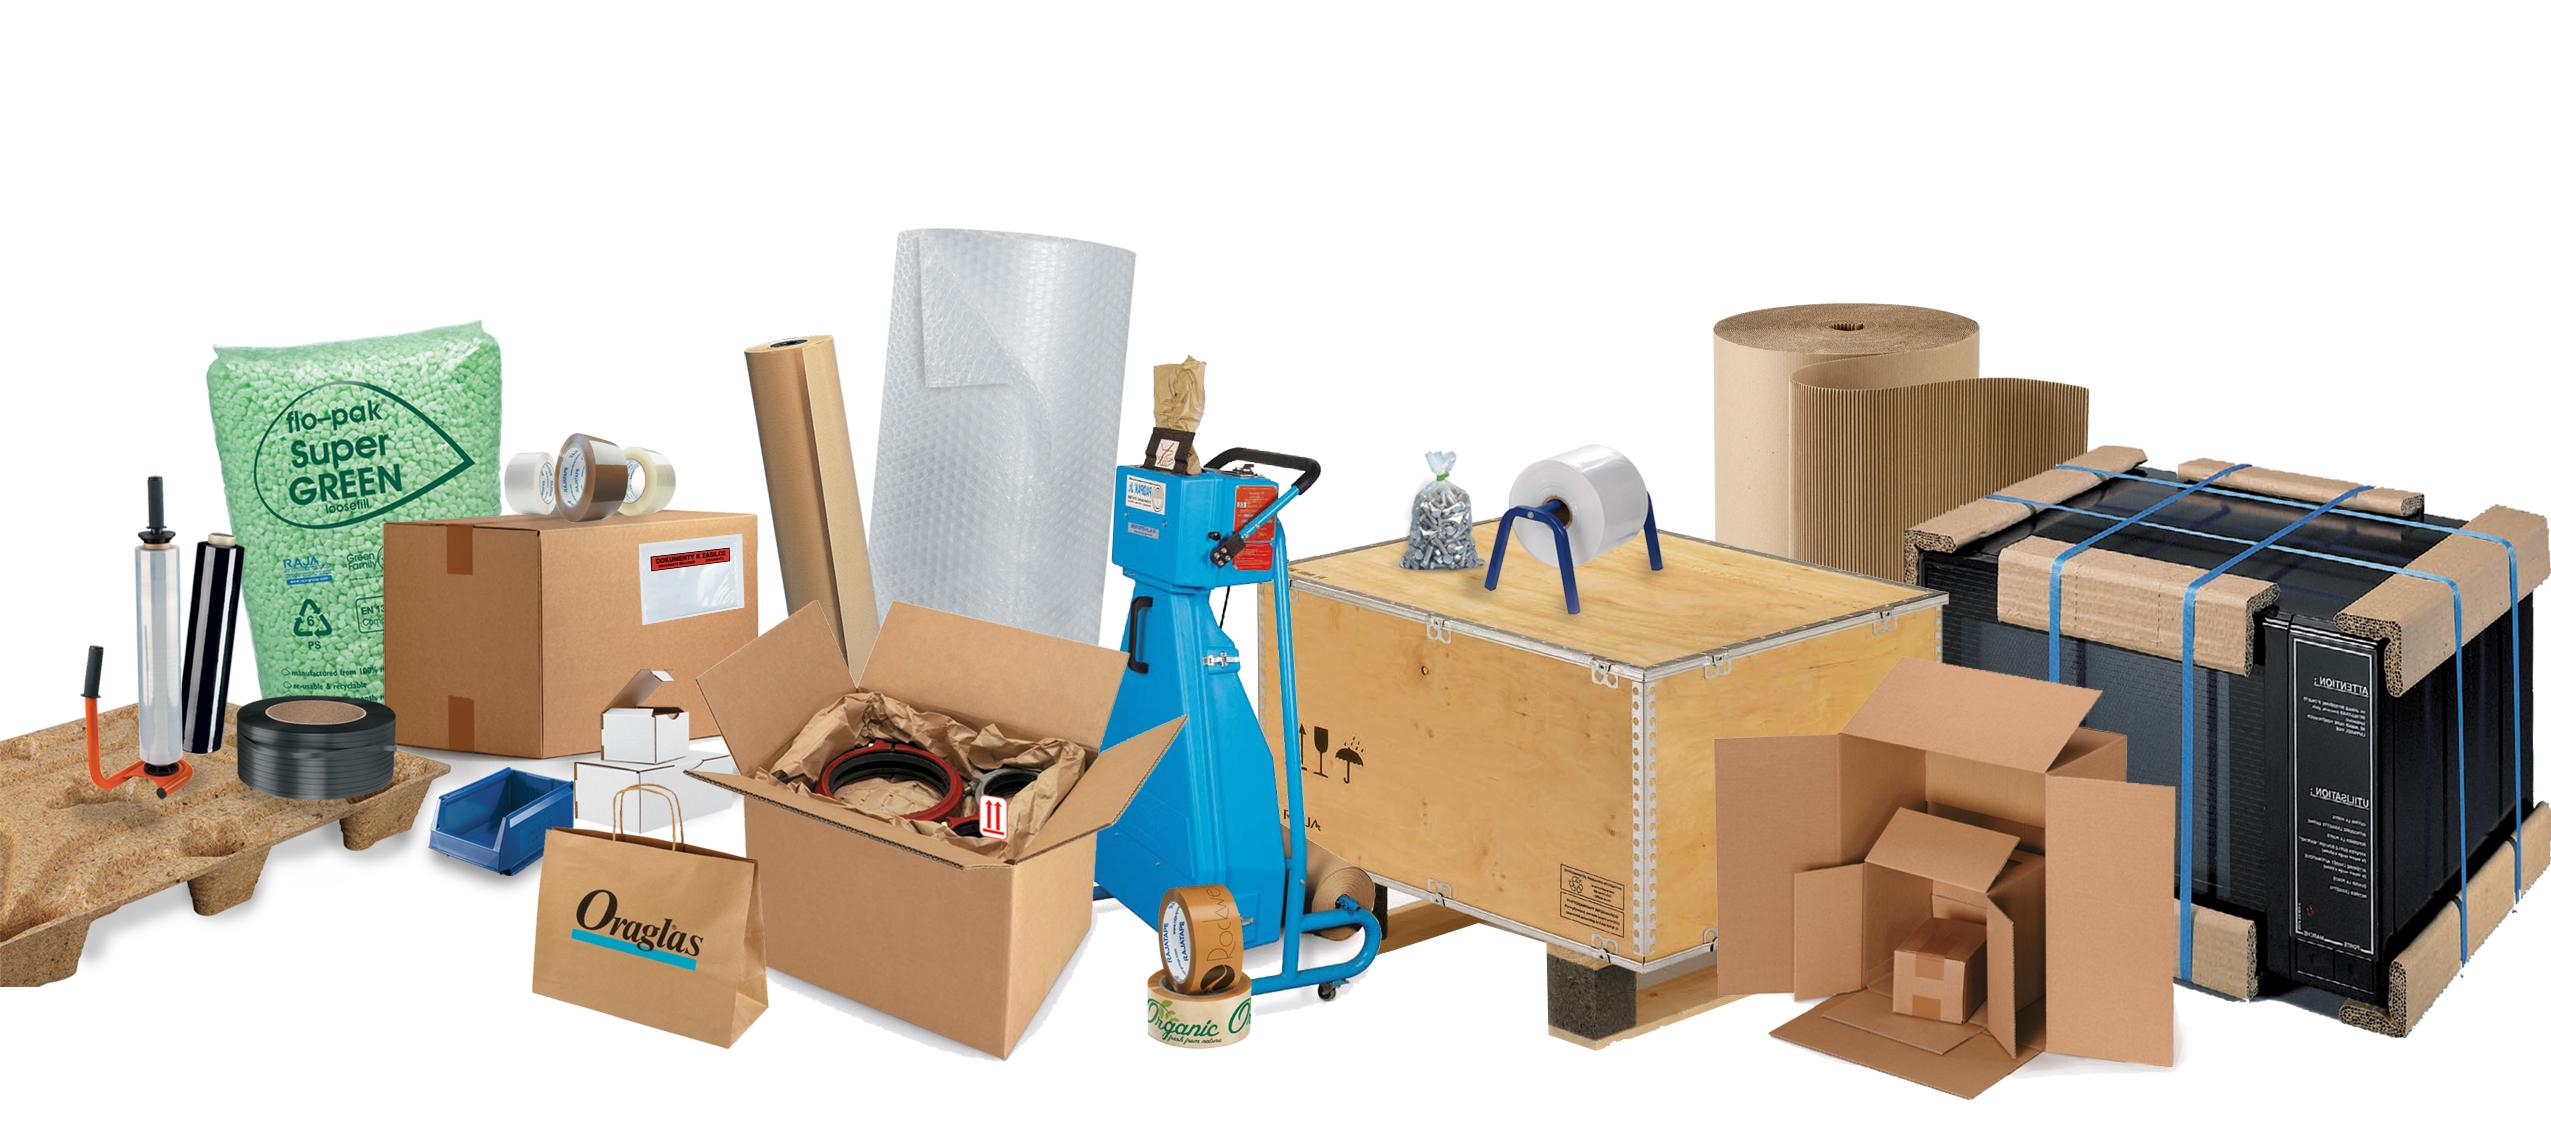 Rajapack Produkte